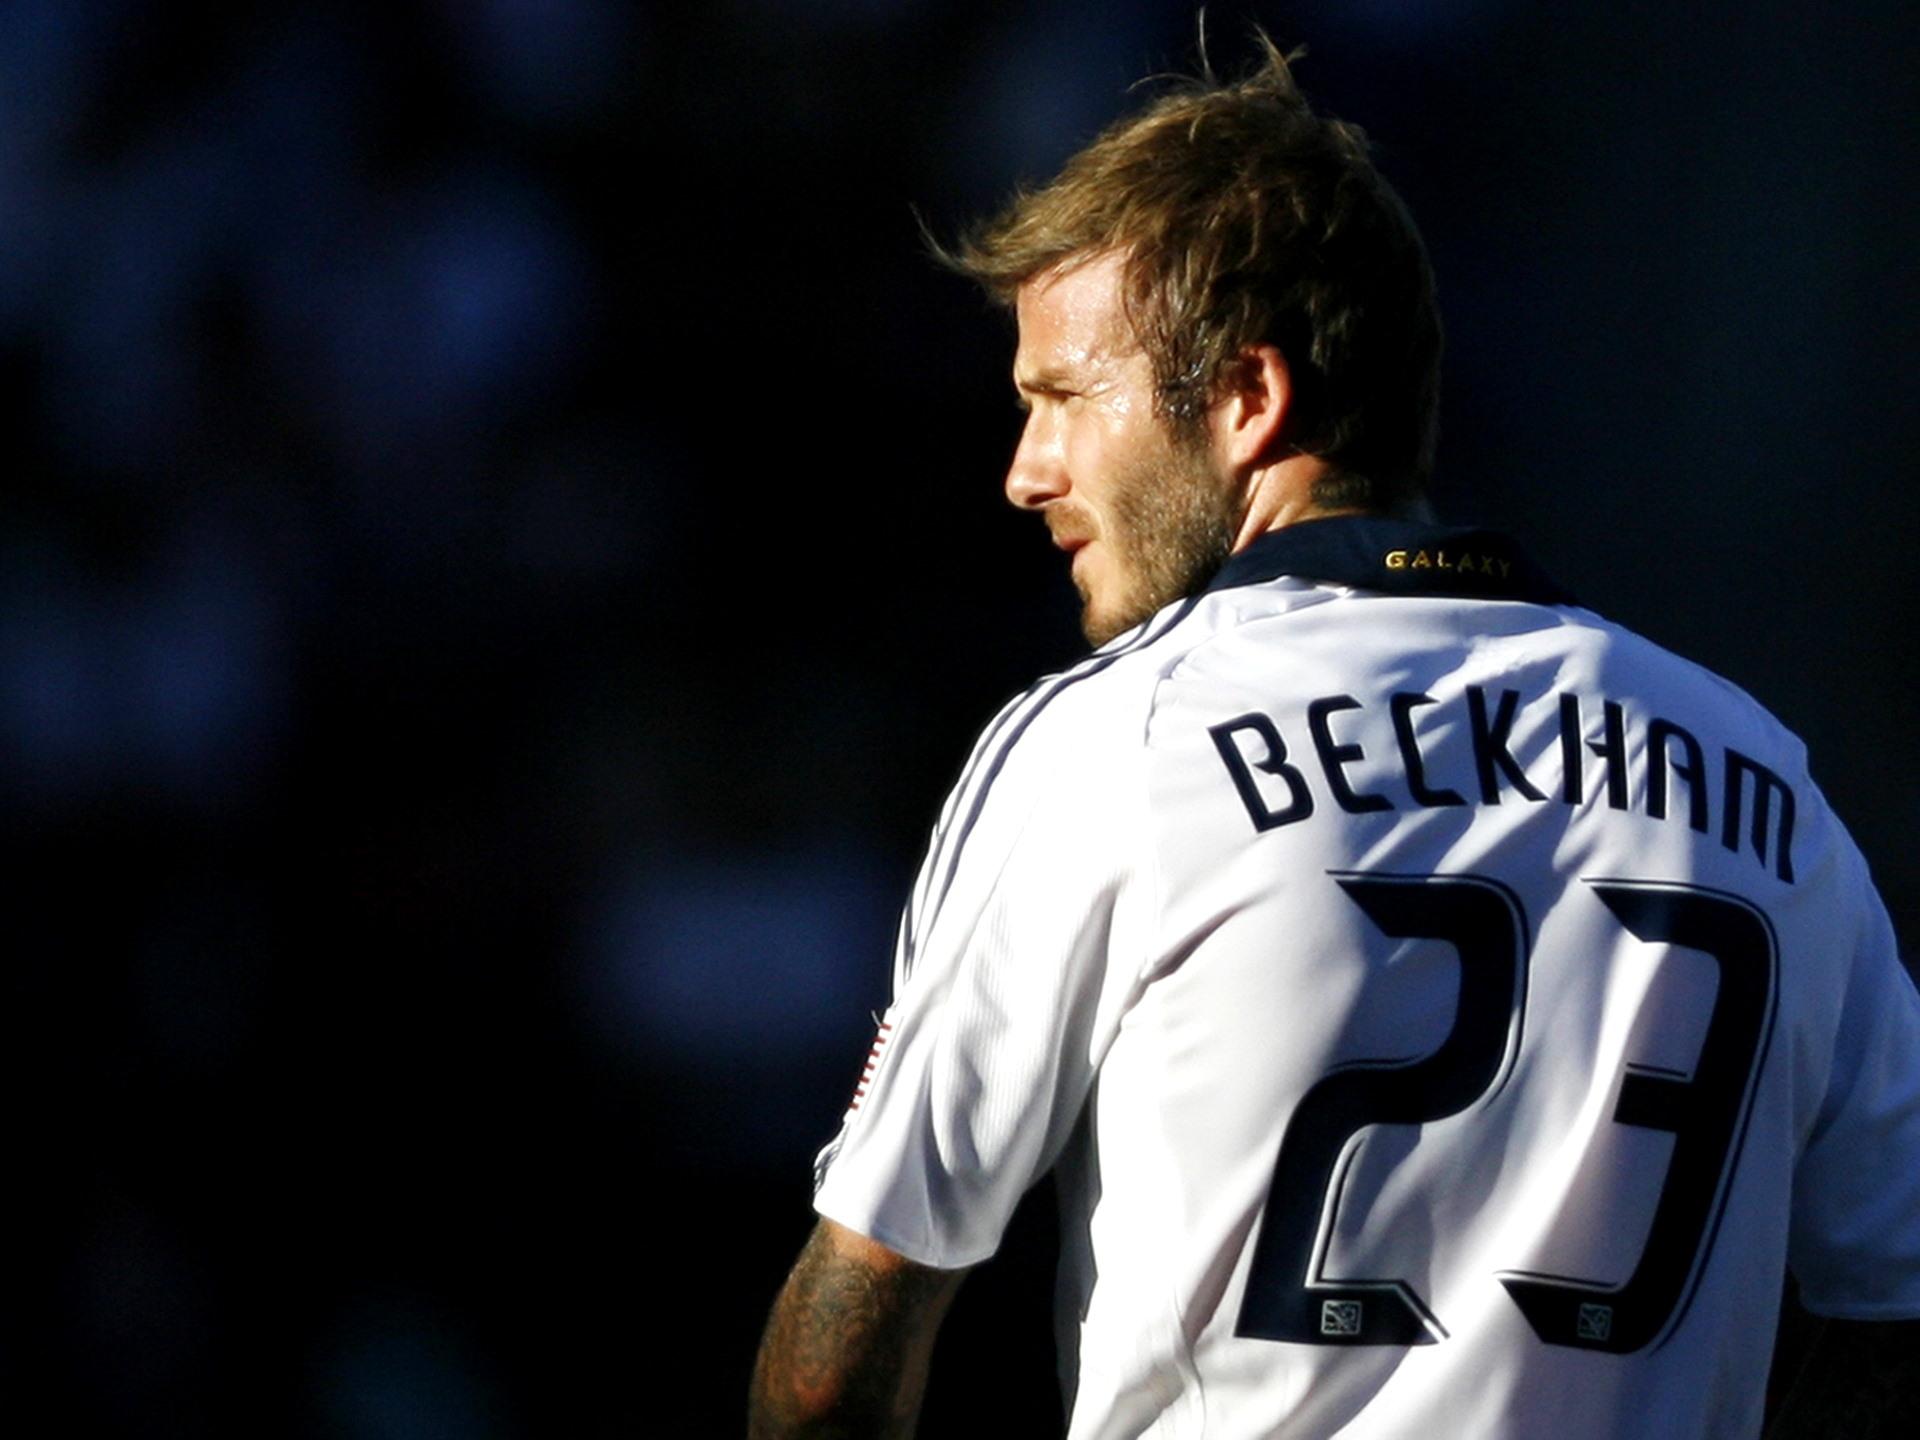 38 David <b>Beckham</b> HD <b>Wallpapers</b> | Backgrounds - <b>Wallpaper</b> Abyss